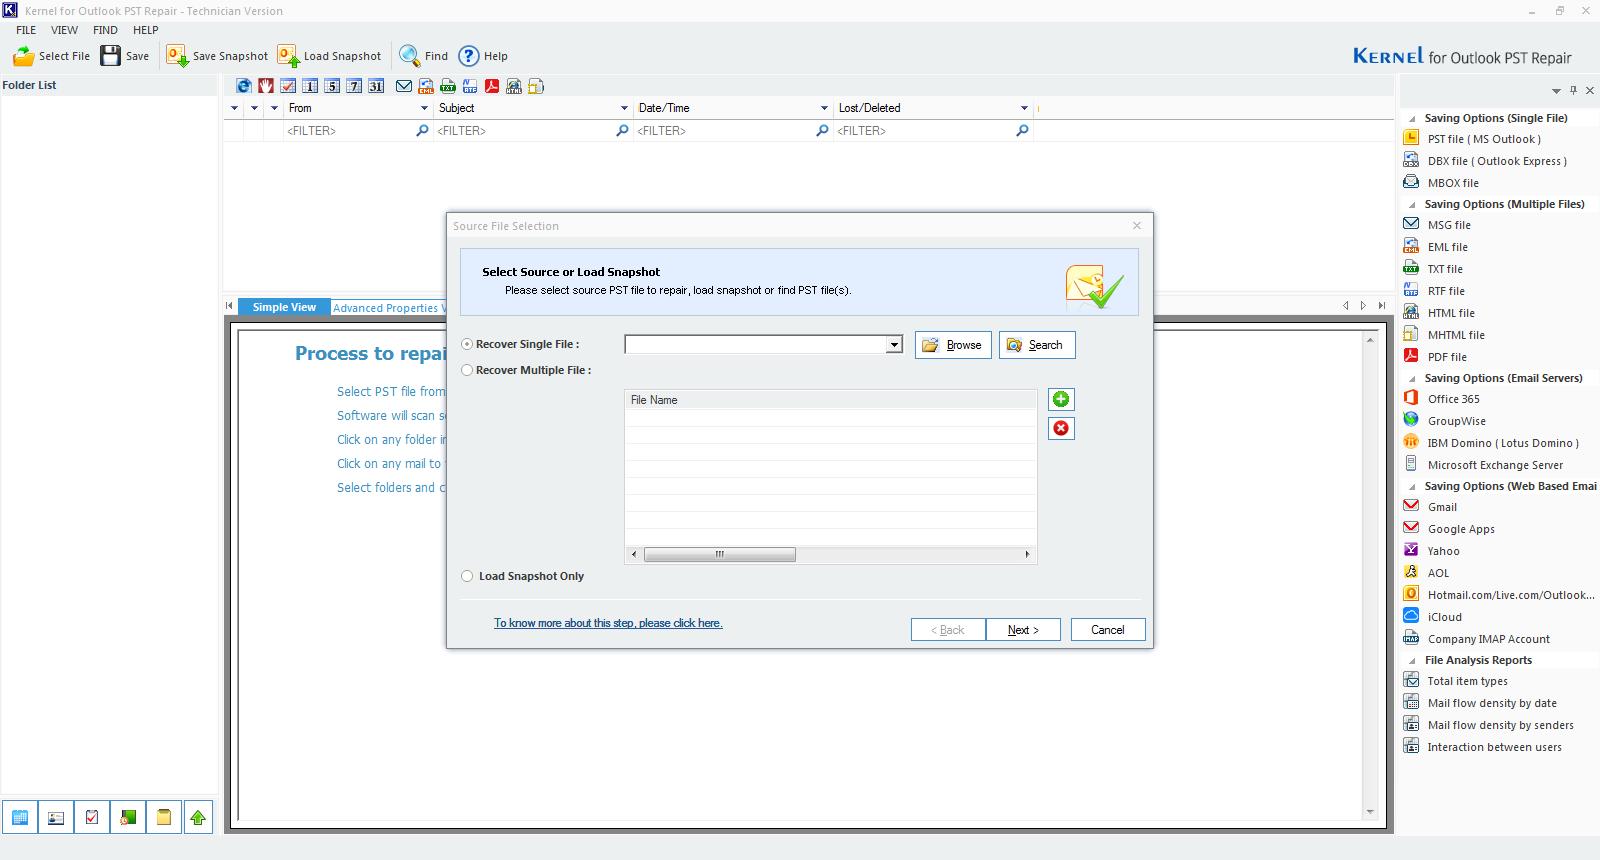 Open Kernel for Outlook PST Repair